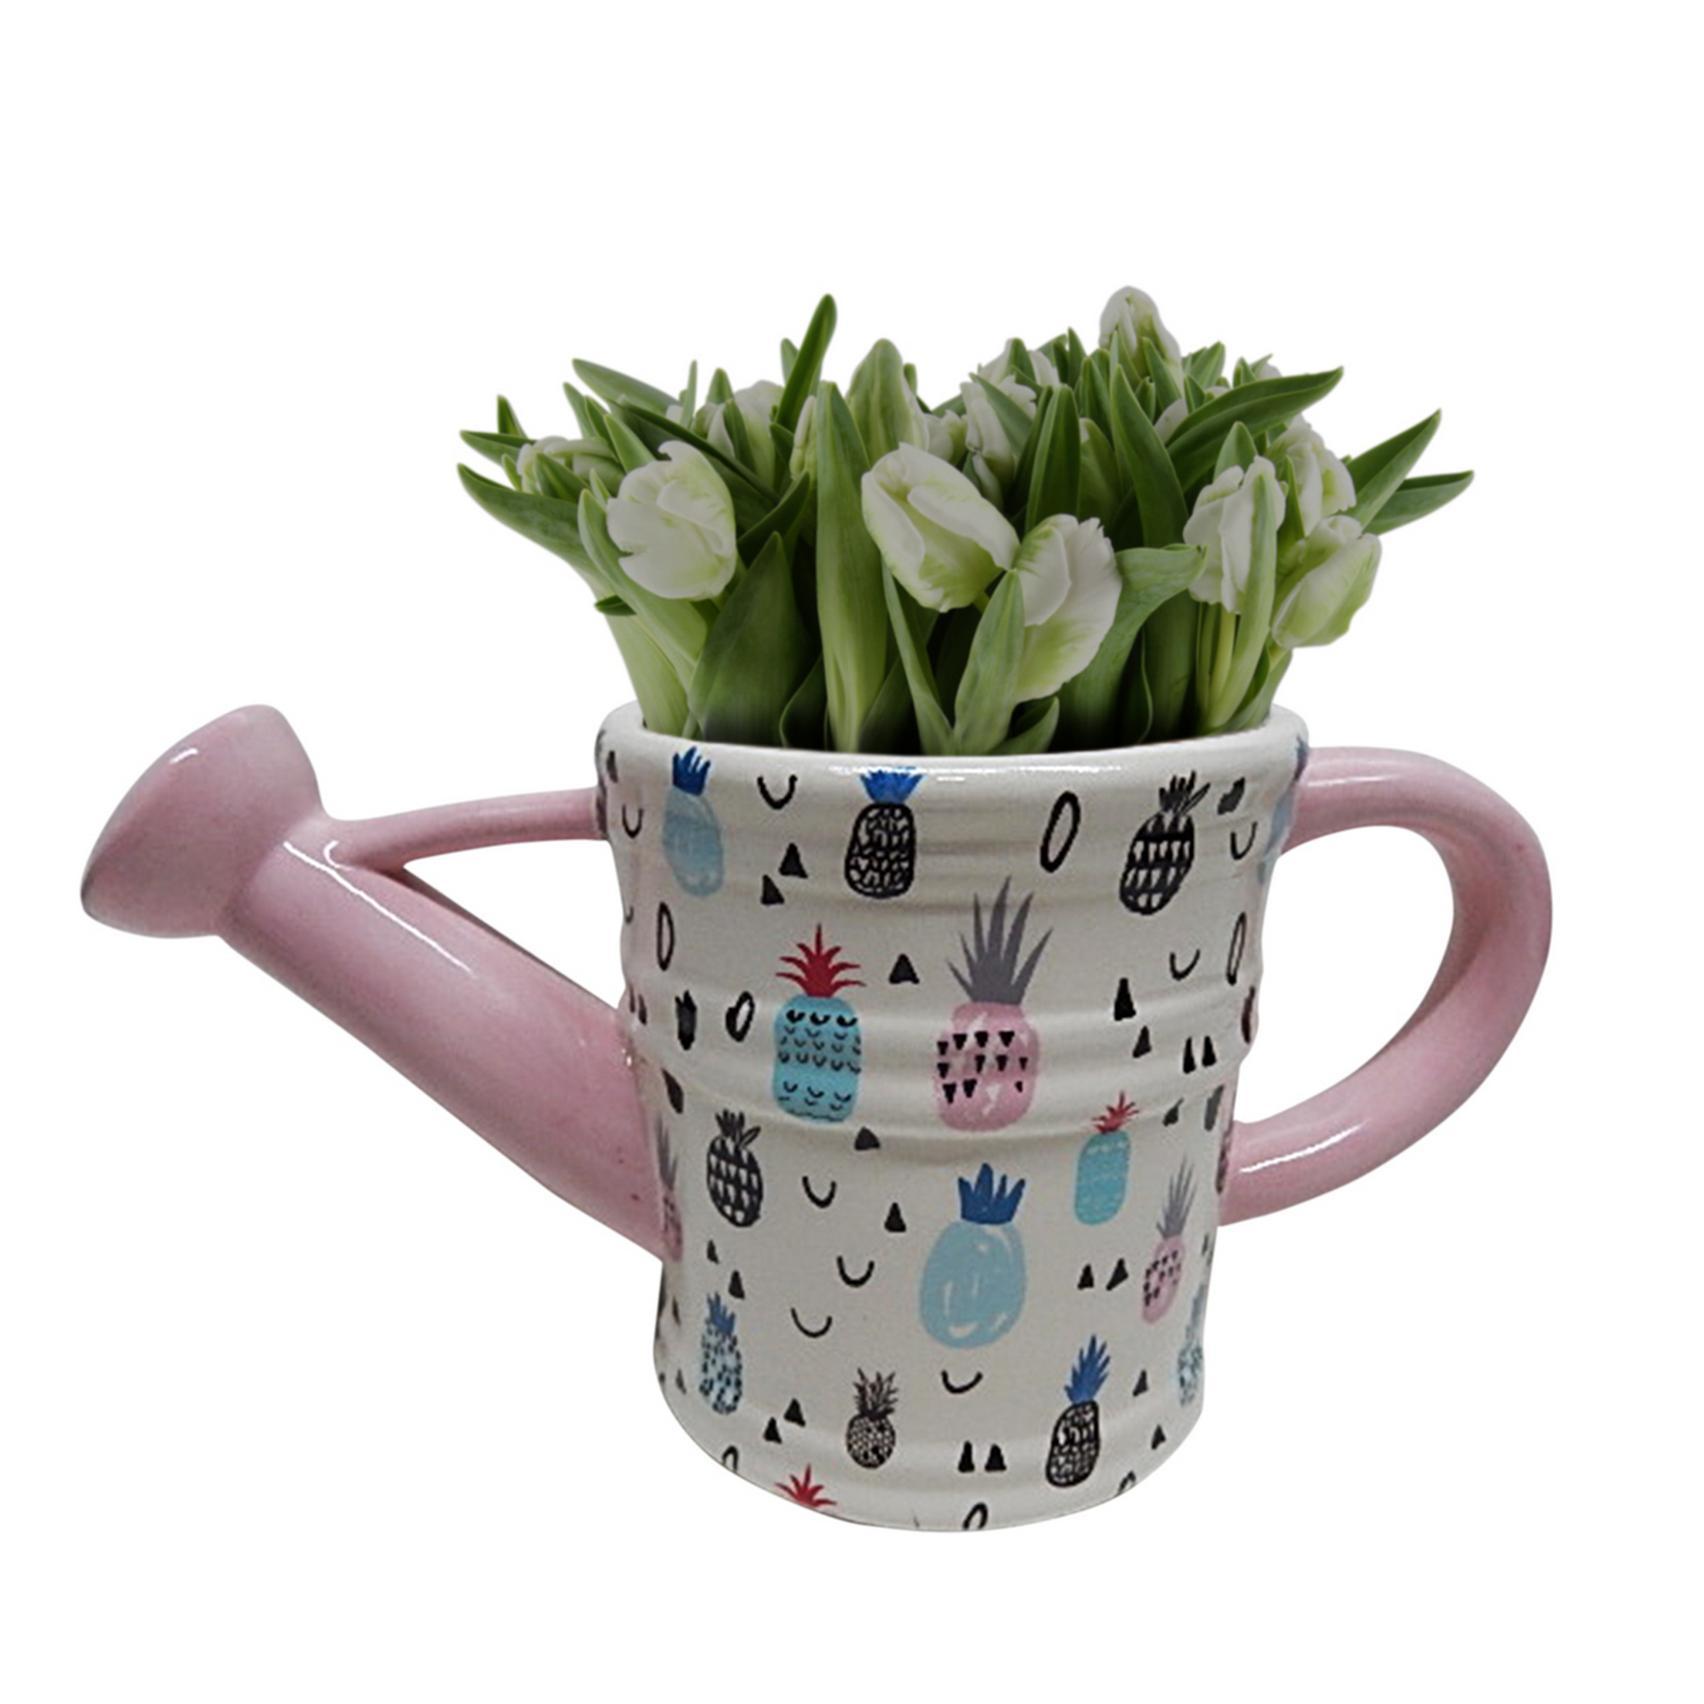 Vaso Cerâmica Drawn Pineapple Watering Can Fd Branco 28 X 12,5 X 14 Cm - Urban